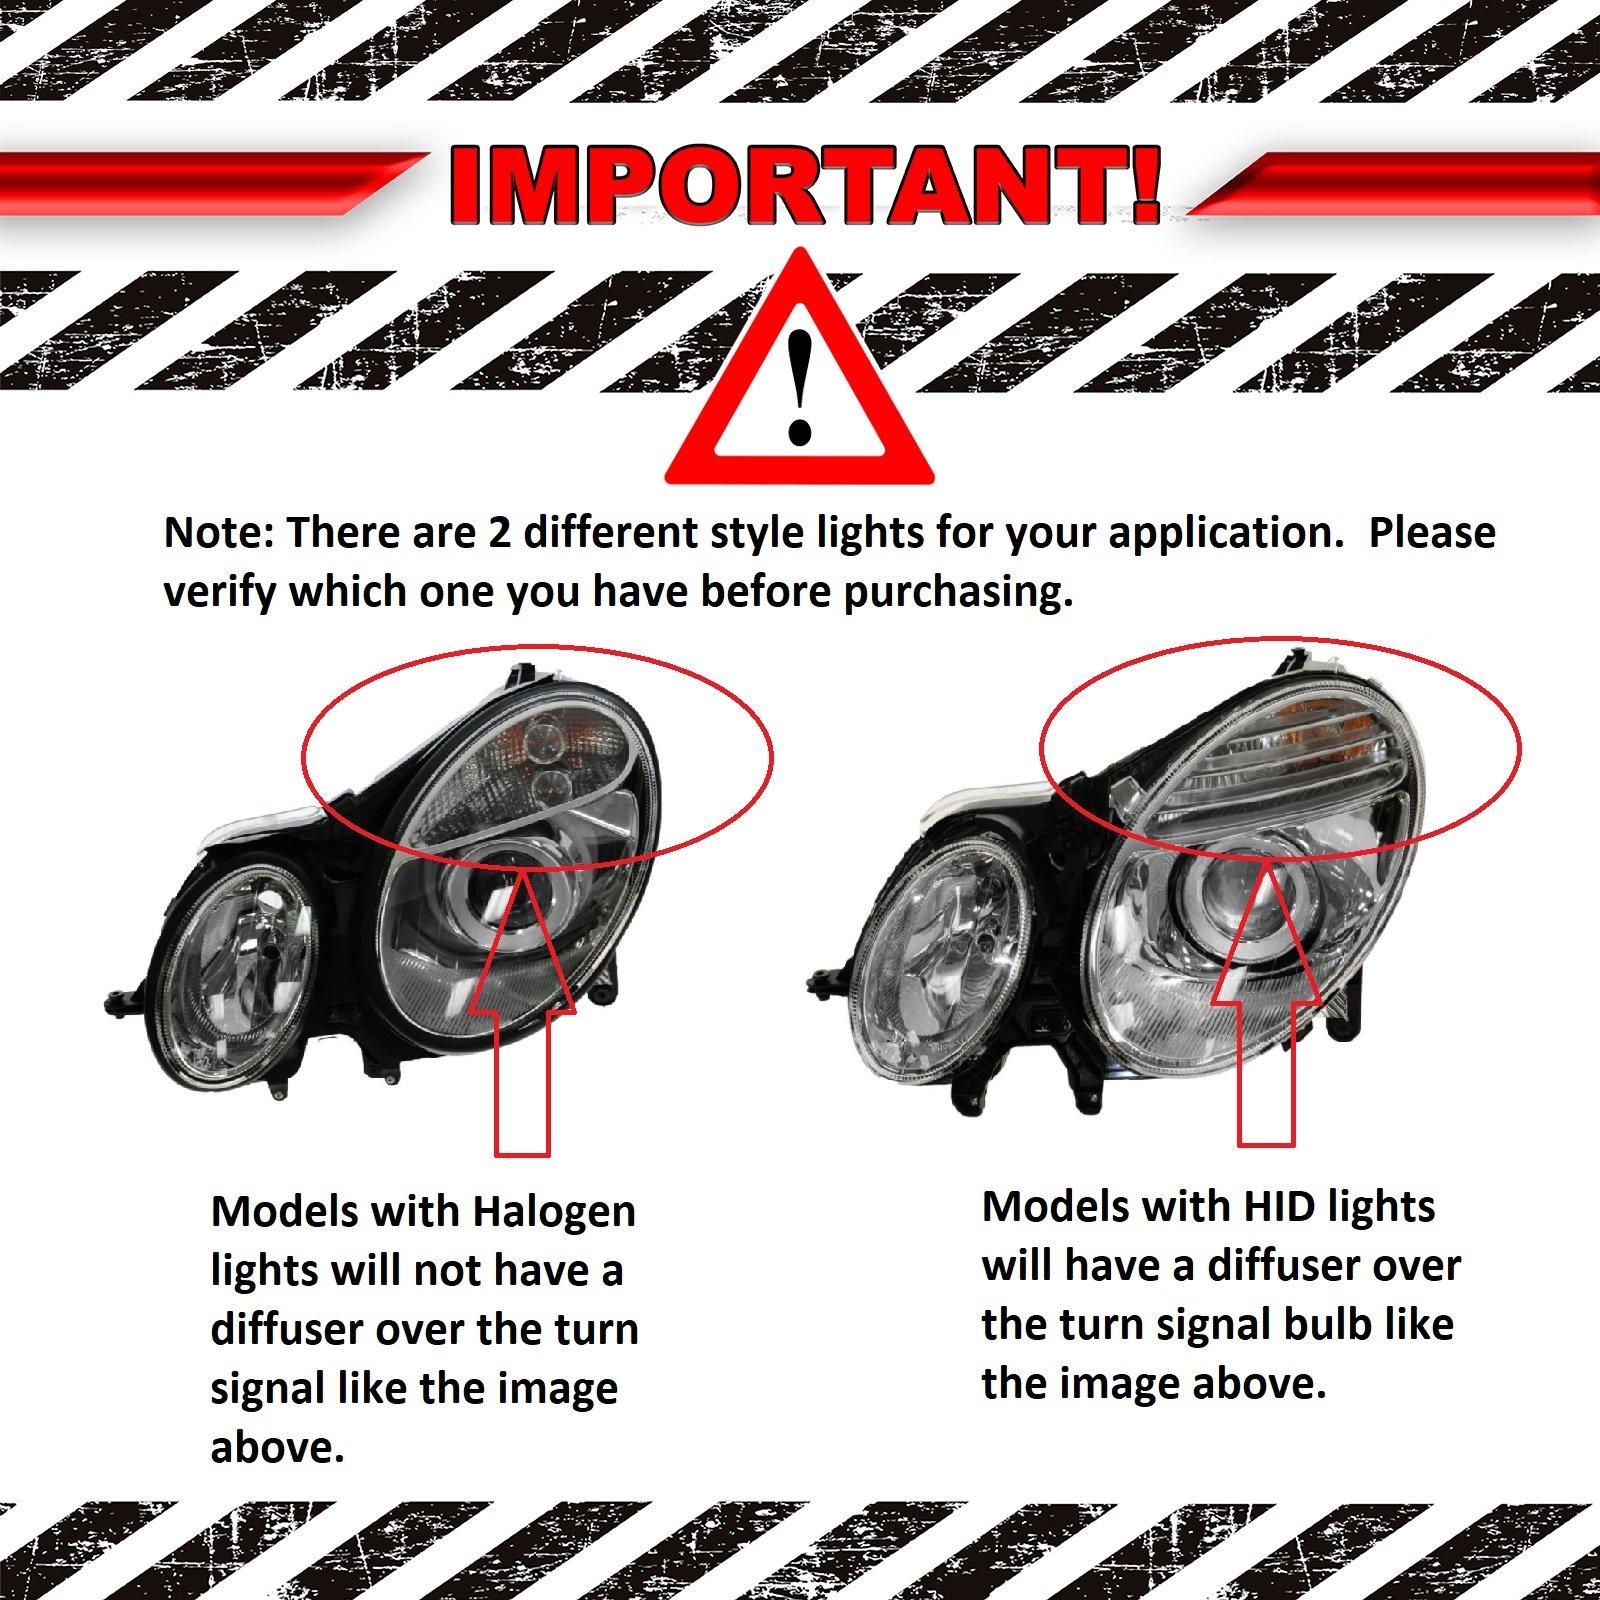 Xtune PRO-JH-MBW21103-C Headlight Mercedes Benz W211 E-Class 03-06 Halogen Don/'t fit HID Models OEM Projector s-Chrome